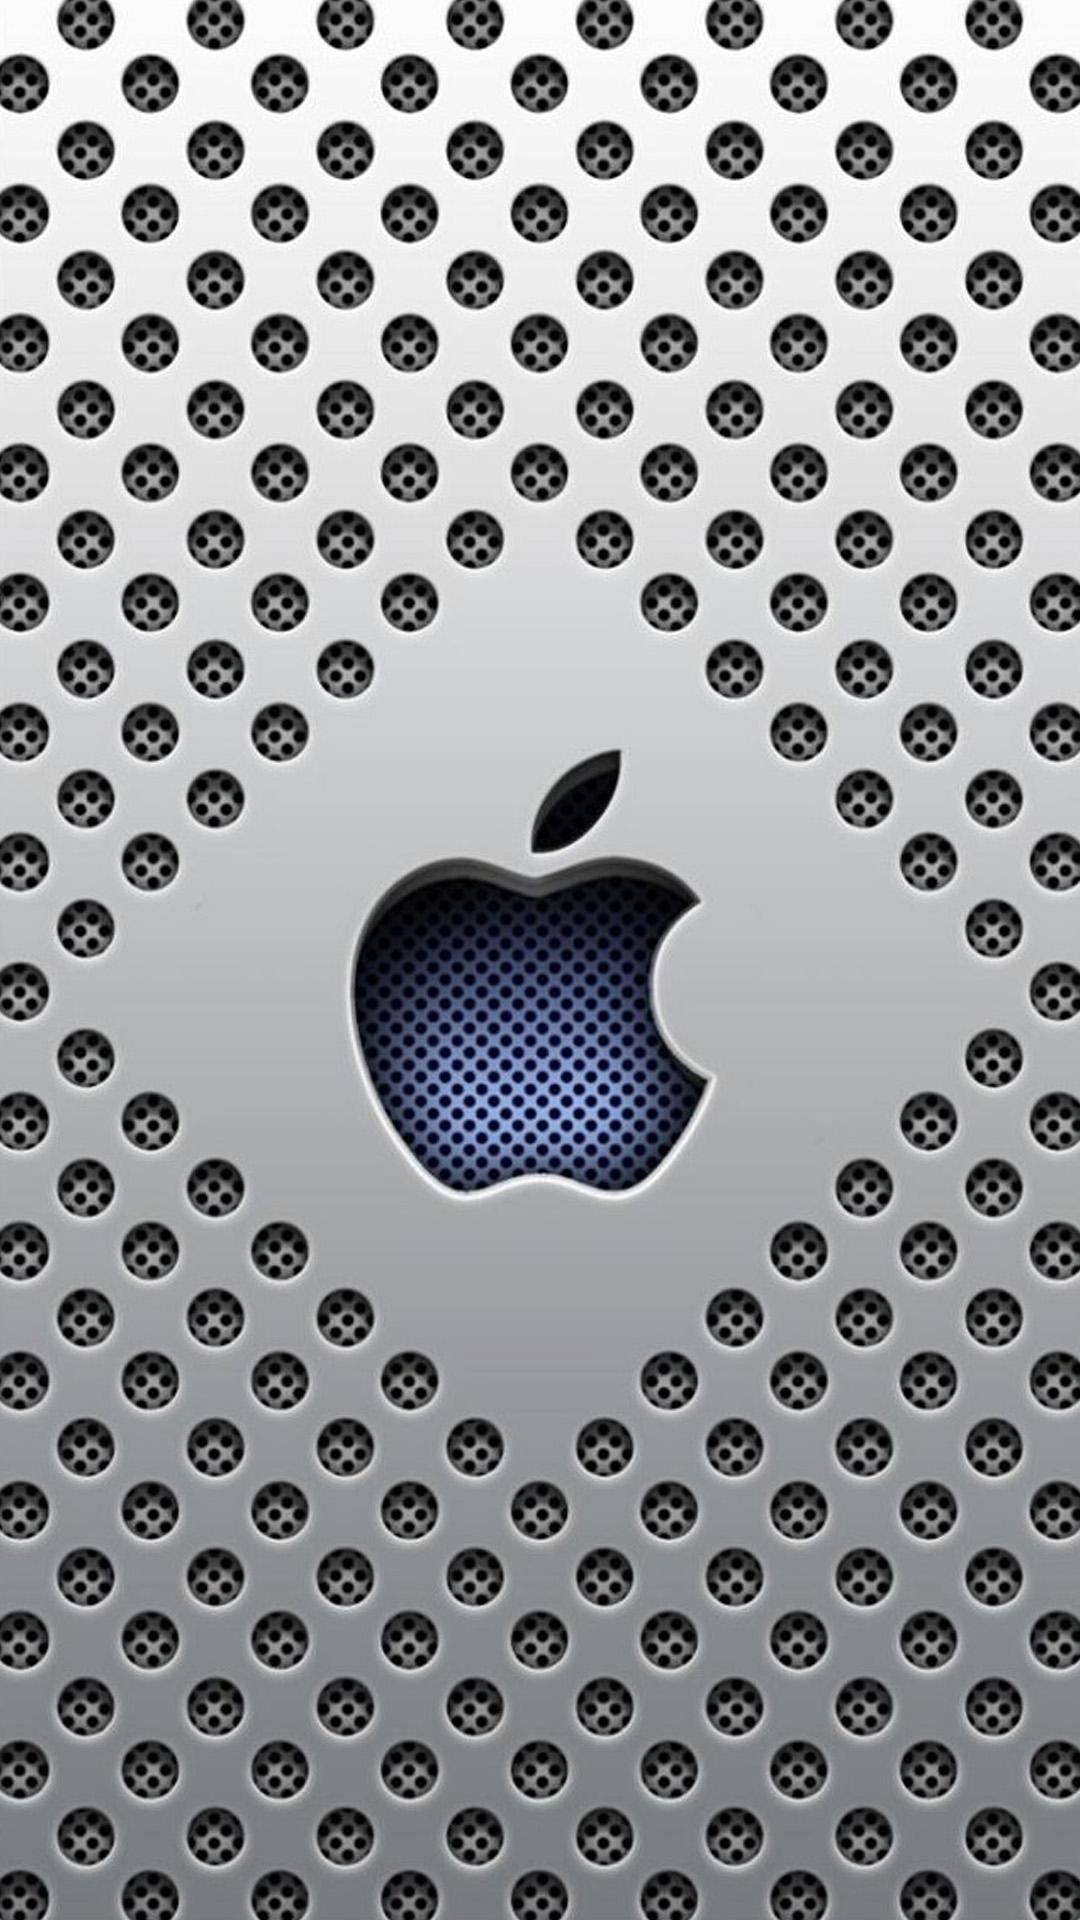 Christmas-Apple-iPhone-Logo-Bing-images-wallpaper-wp3604071